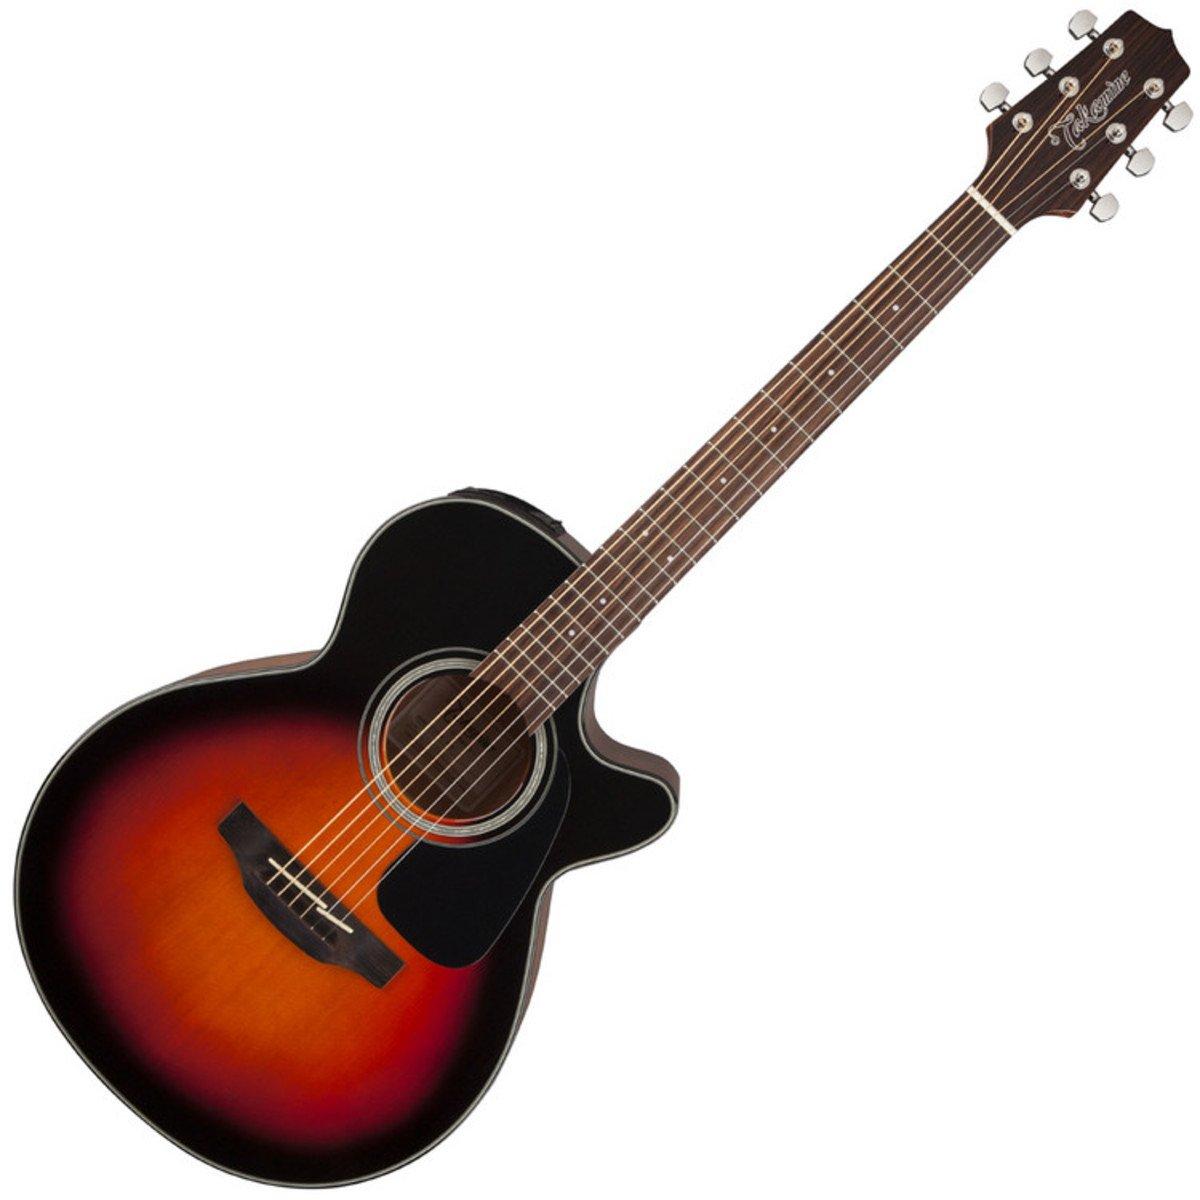 TAKAMINE gf30ce fxc marrón Sunburst A/E Guitarra Performer Pak W ...